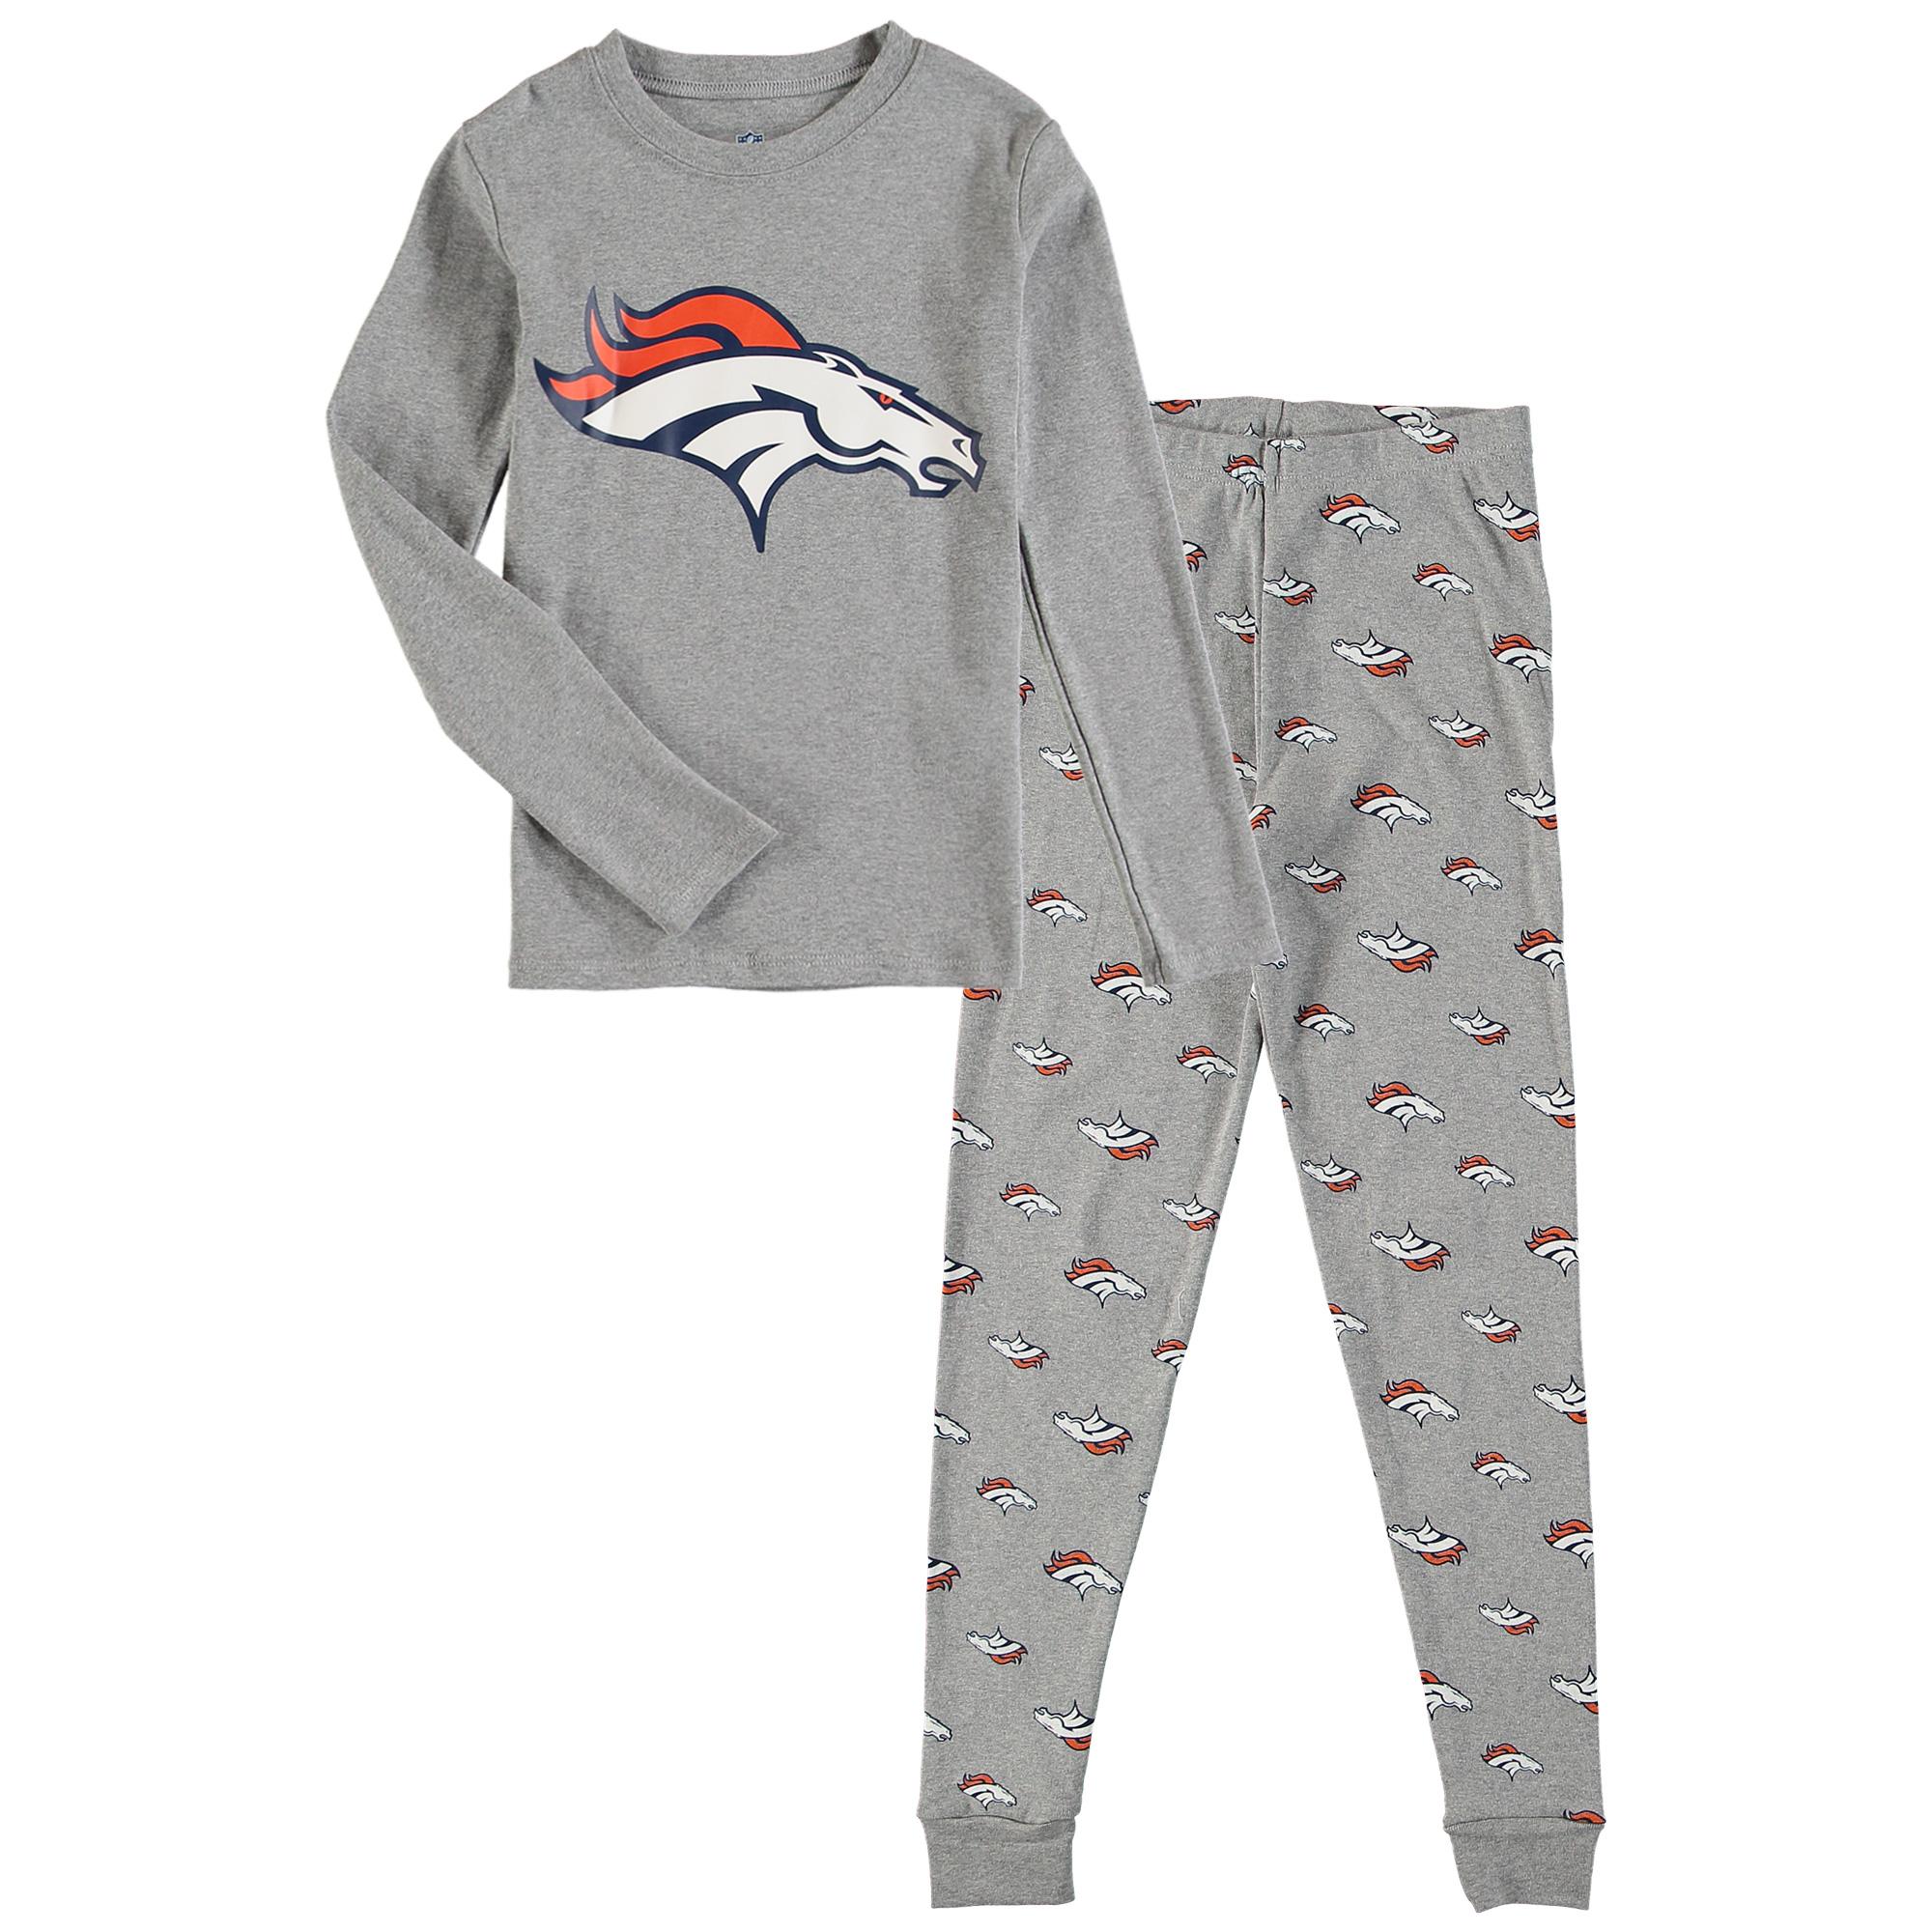 OuterStuff NFL Kids Denver Broncos Long Sleeve Tee & Pant Sleep Set